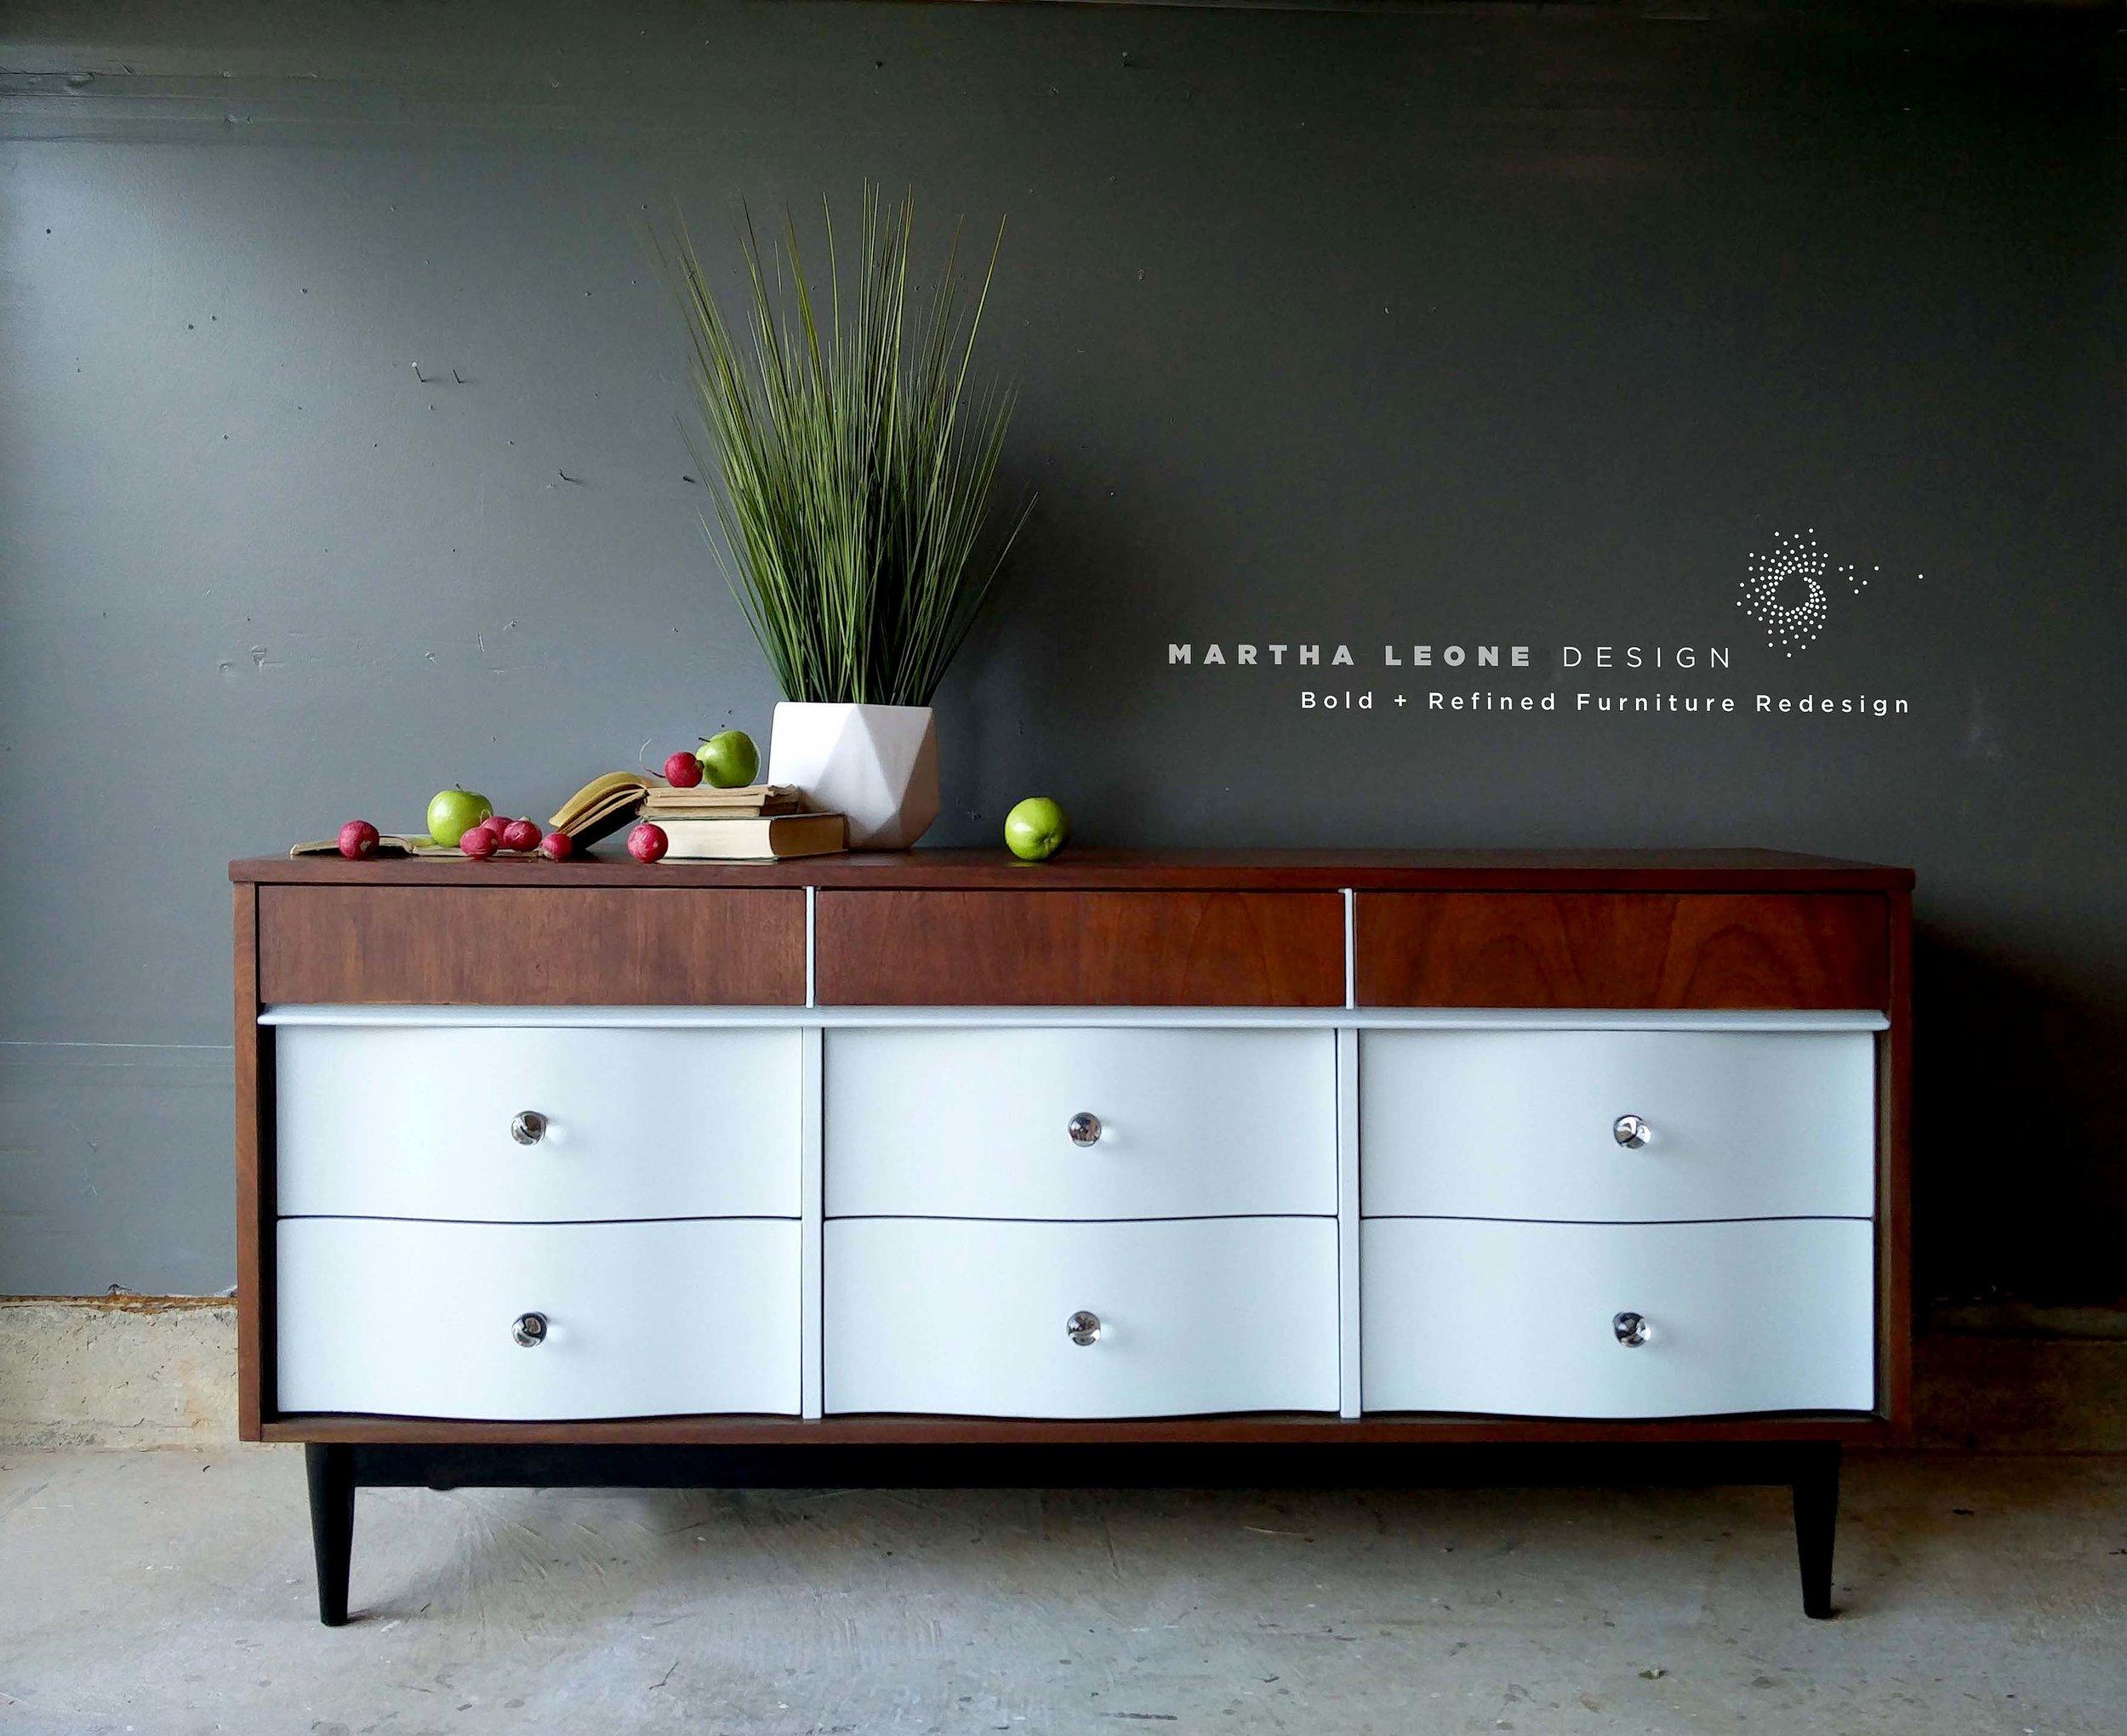 For    Bracey Designs    — Client's home, Charlottesville, VA